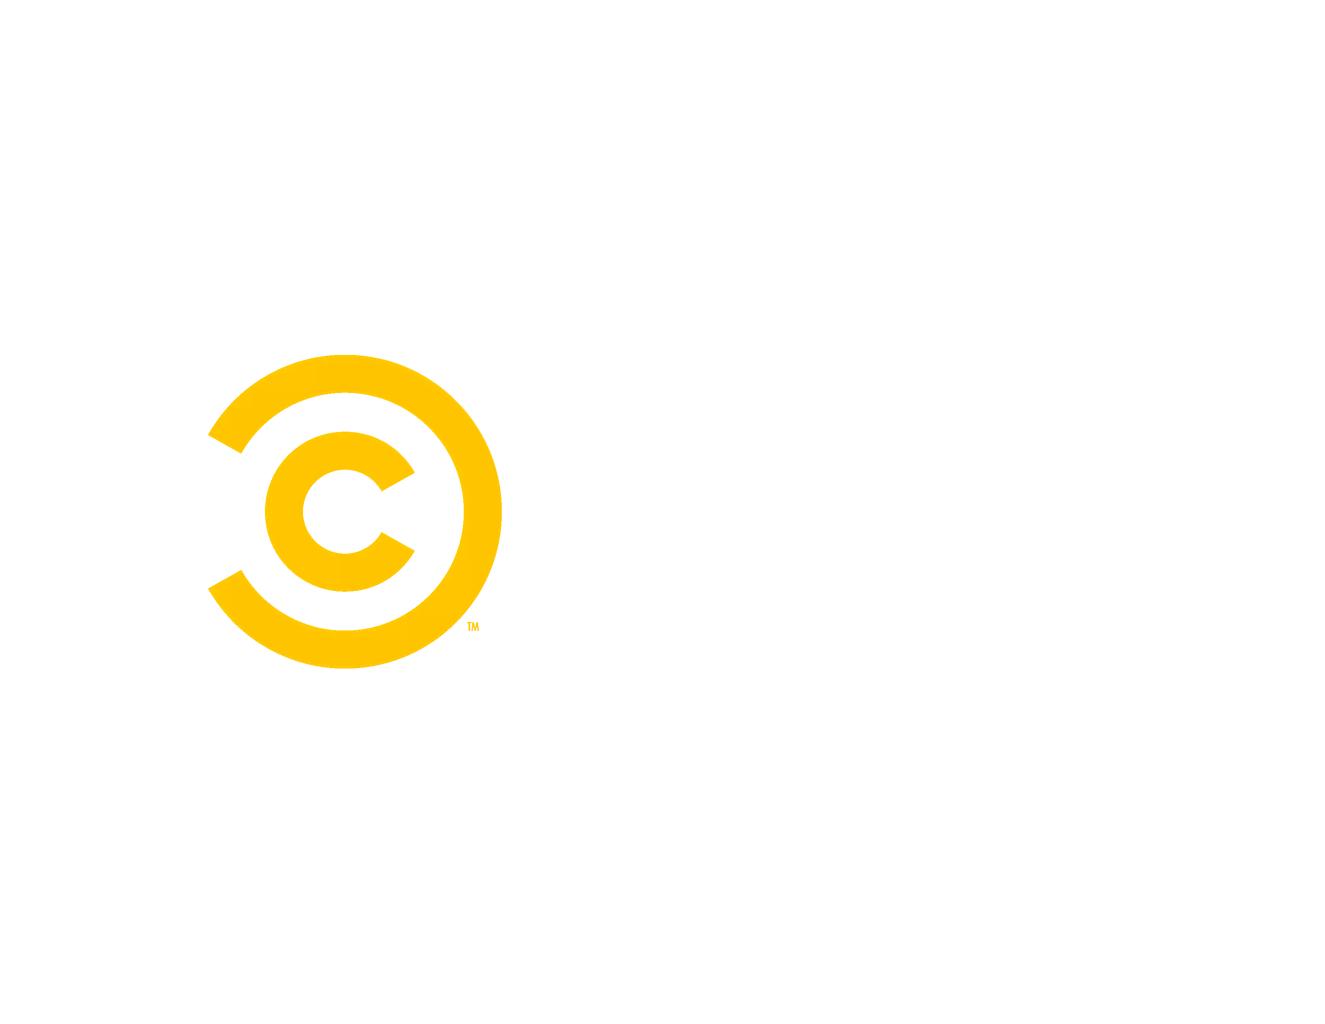 CC Logos.